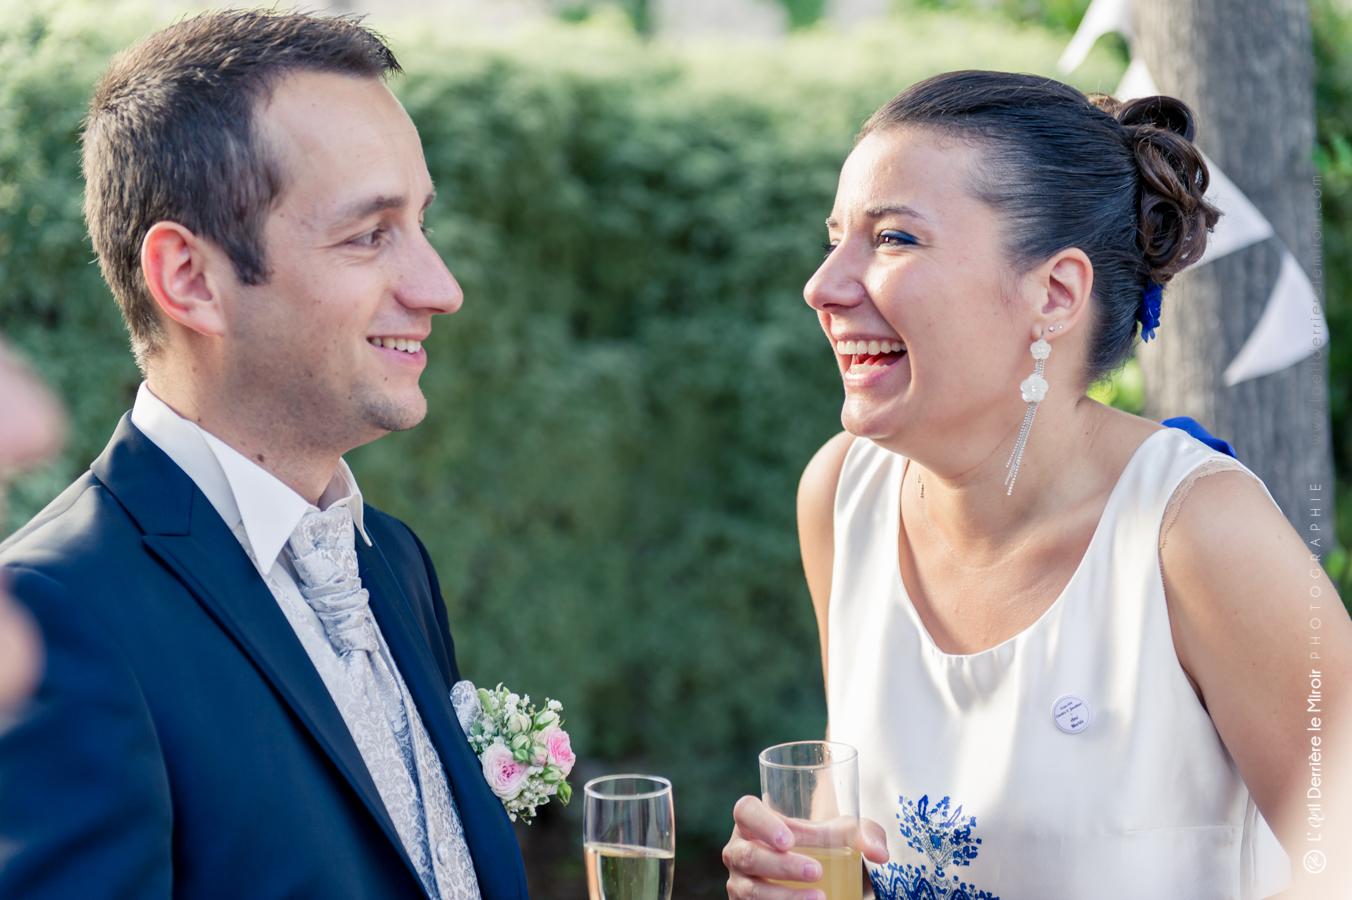 mariage-cj-vaugrenier-loeilderrierelemiroir-057